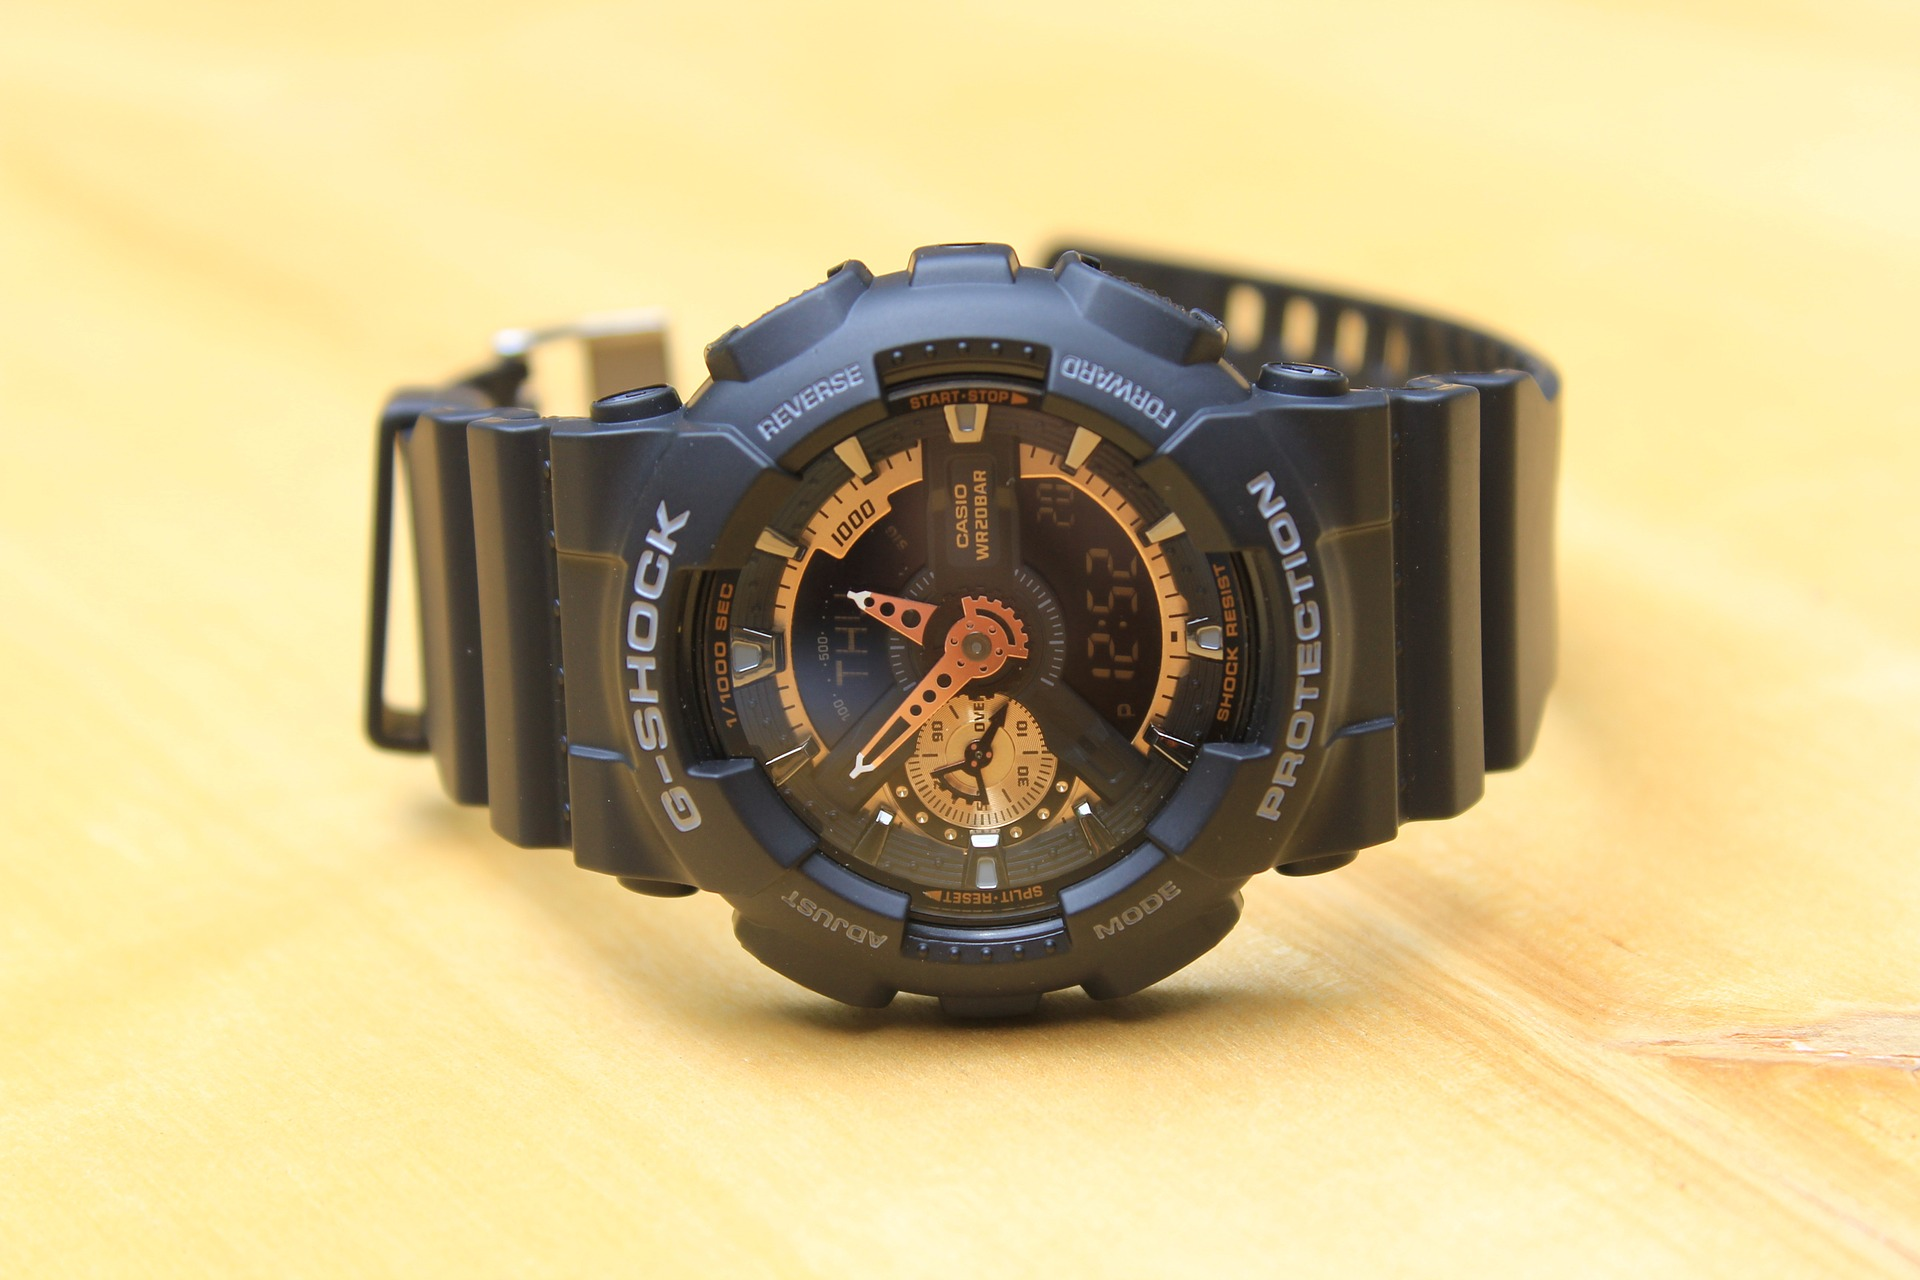 Stoere nieuwe horloges van G-shock